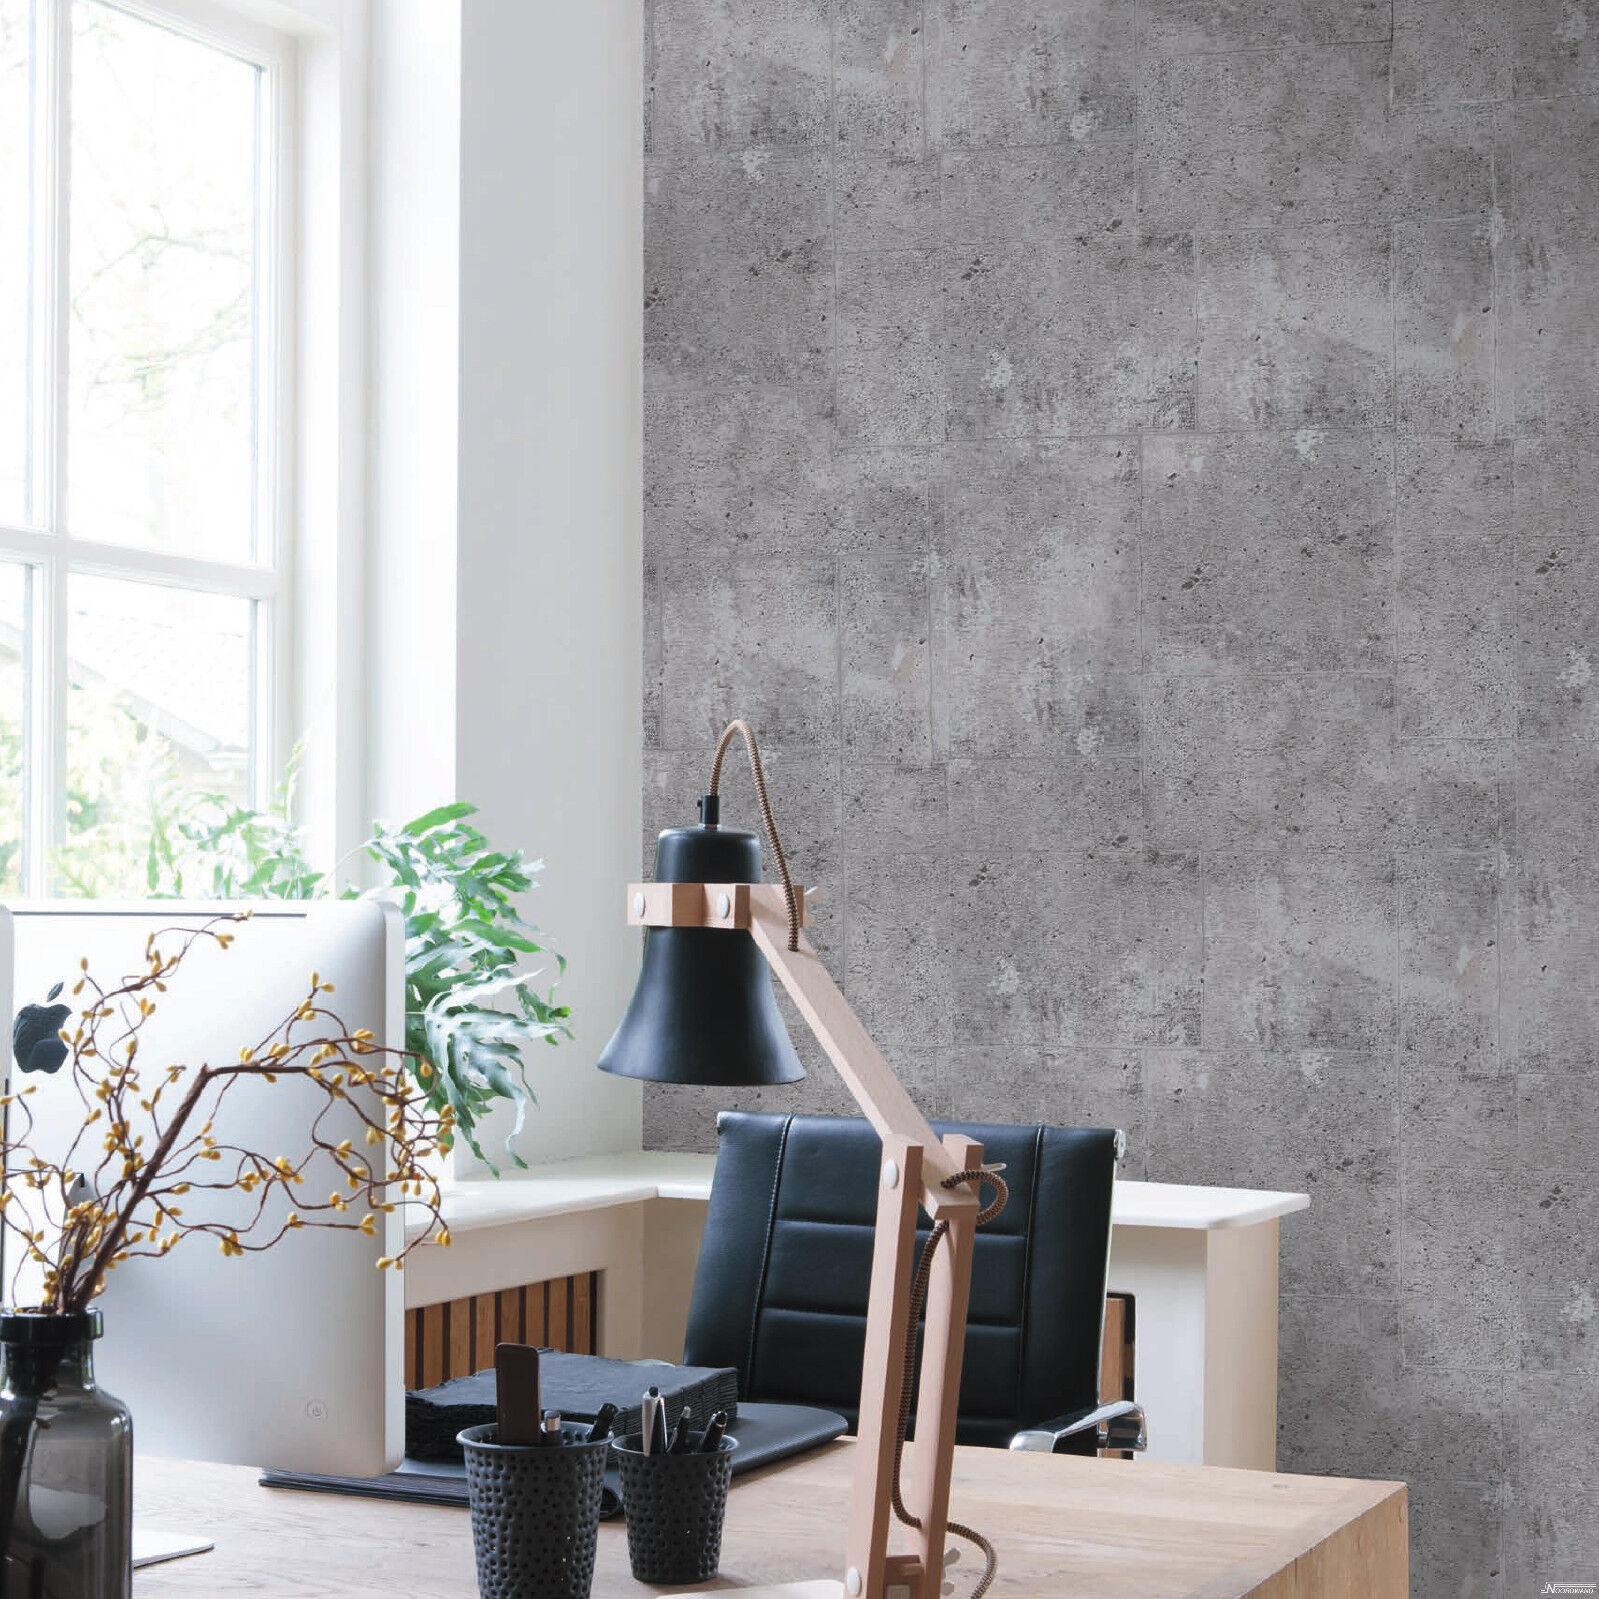 Vliestapete Beton Optik Grau Betontapete Industrial Loft Stein Wand 68653  ...